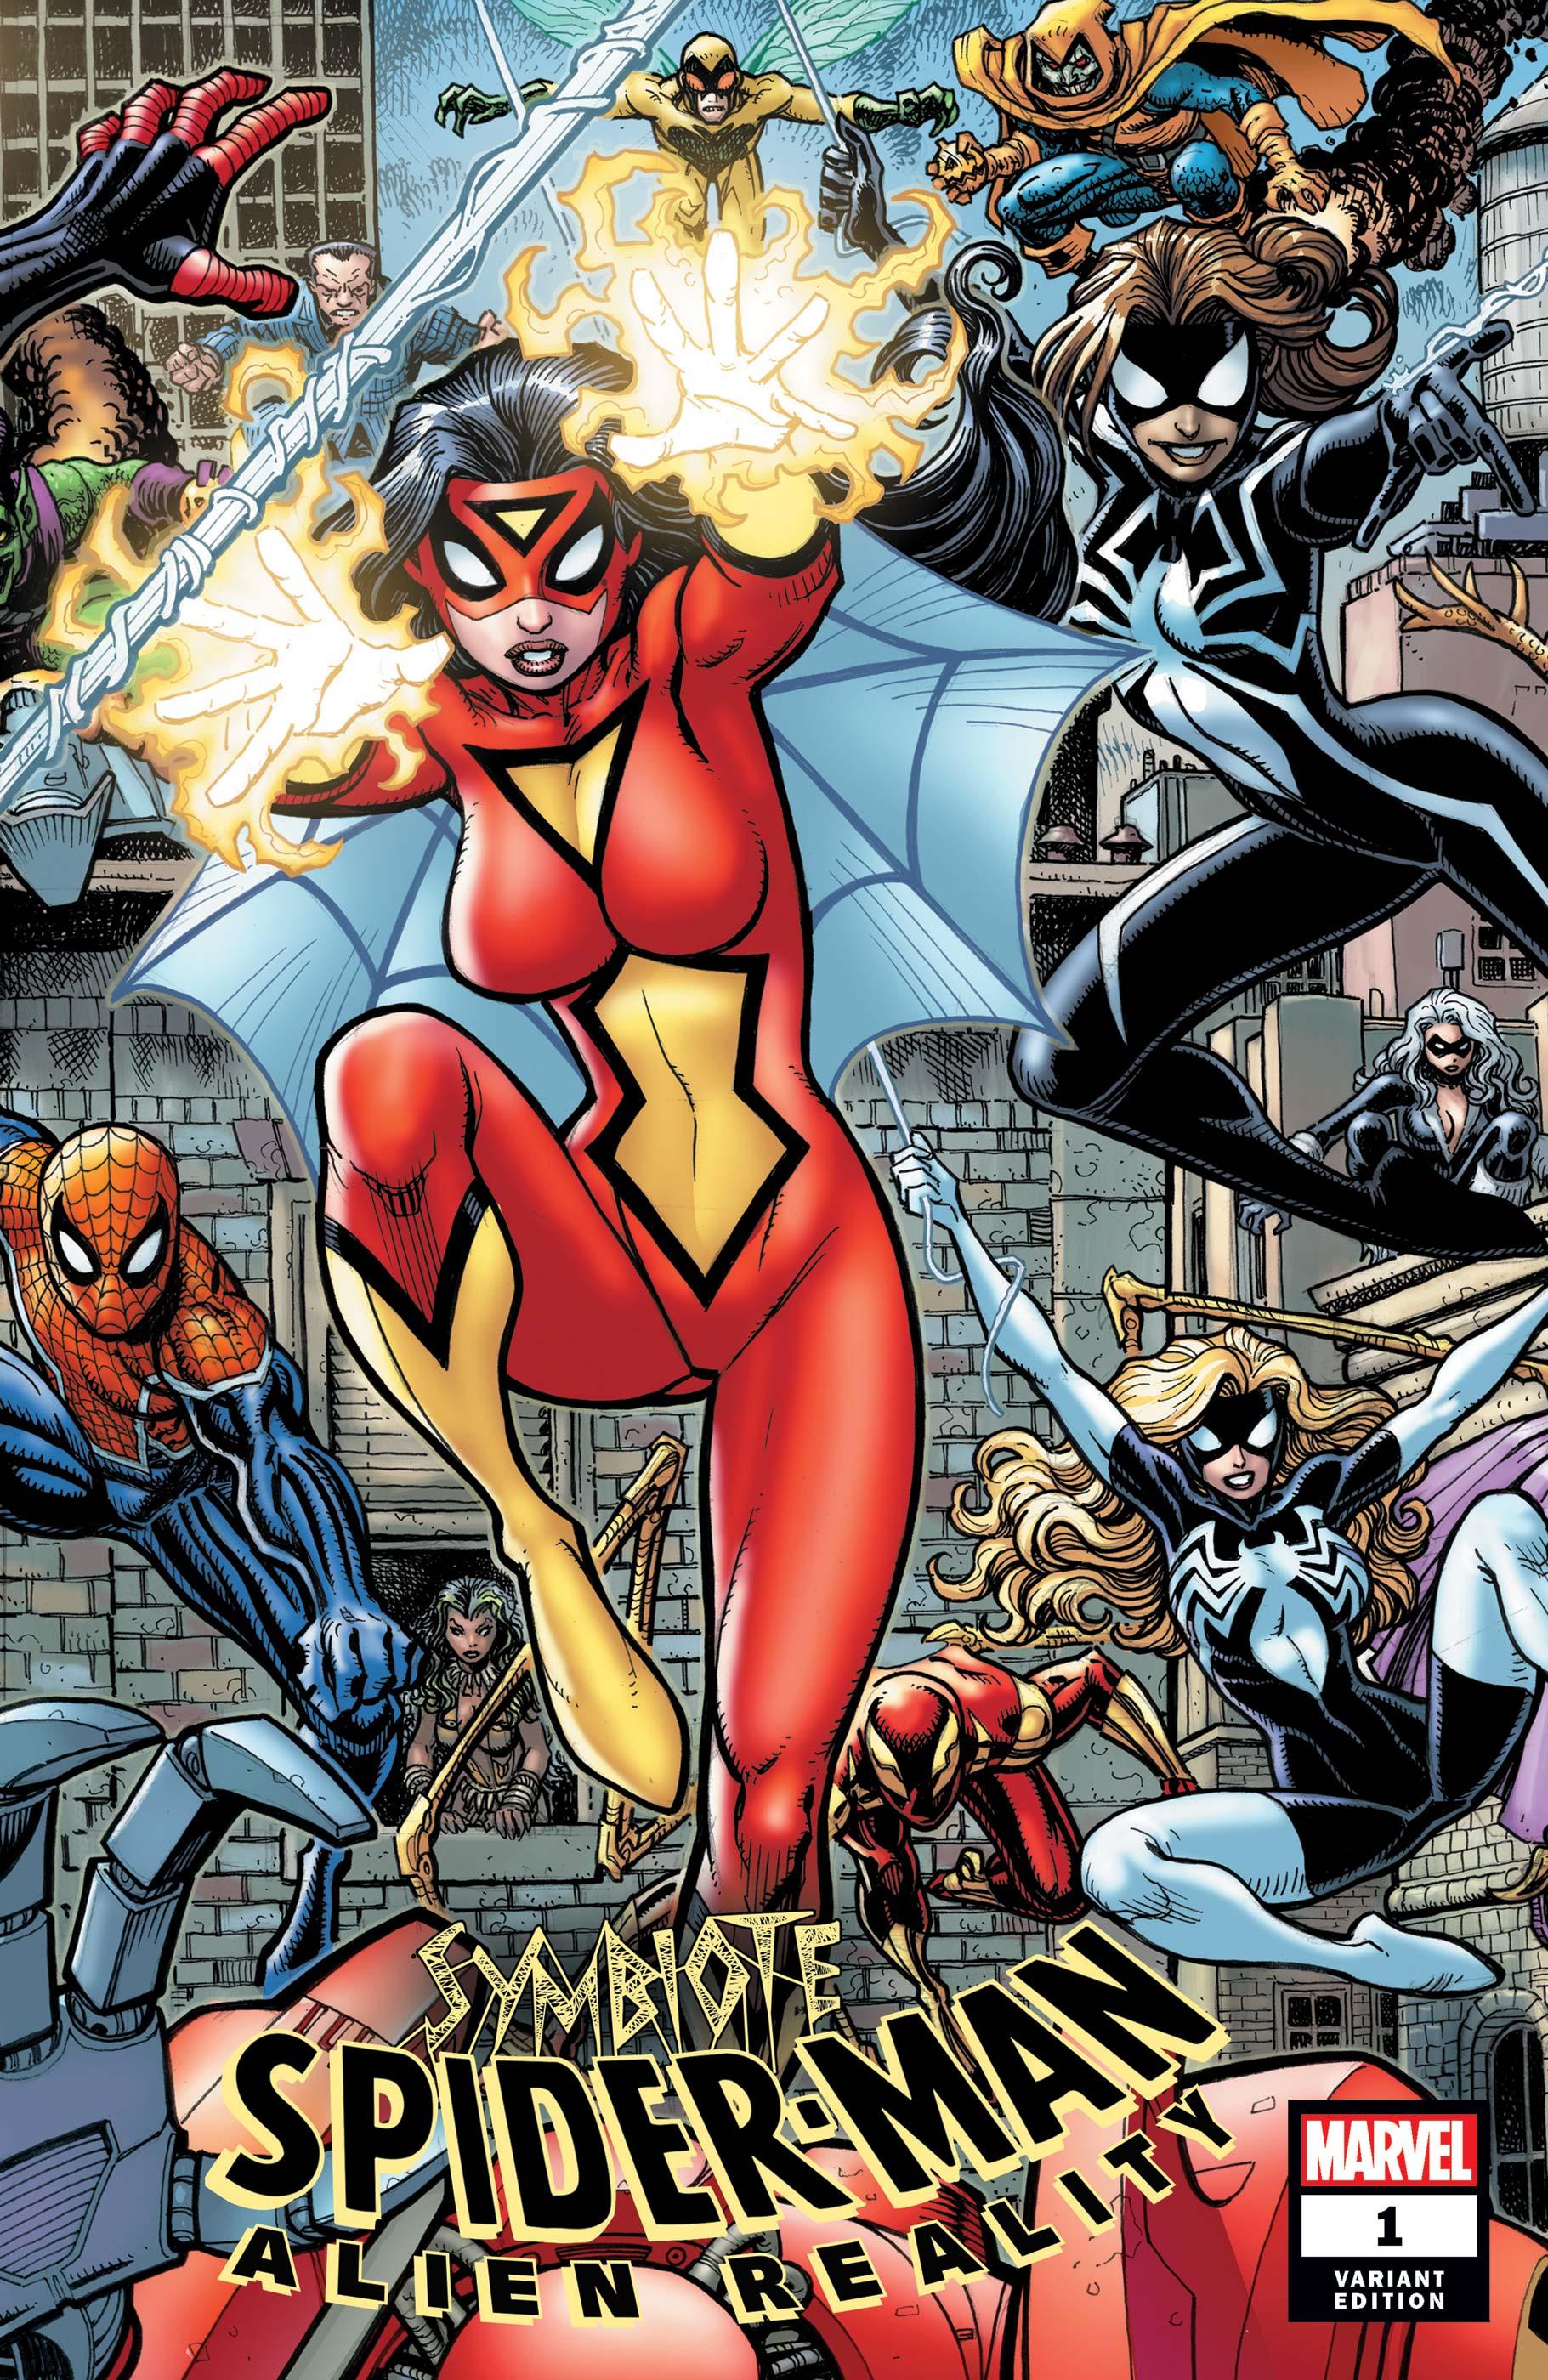 Symbiote Spider-Man Alien Reality Vol 1 1 Adams Connecting Variant.jpg